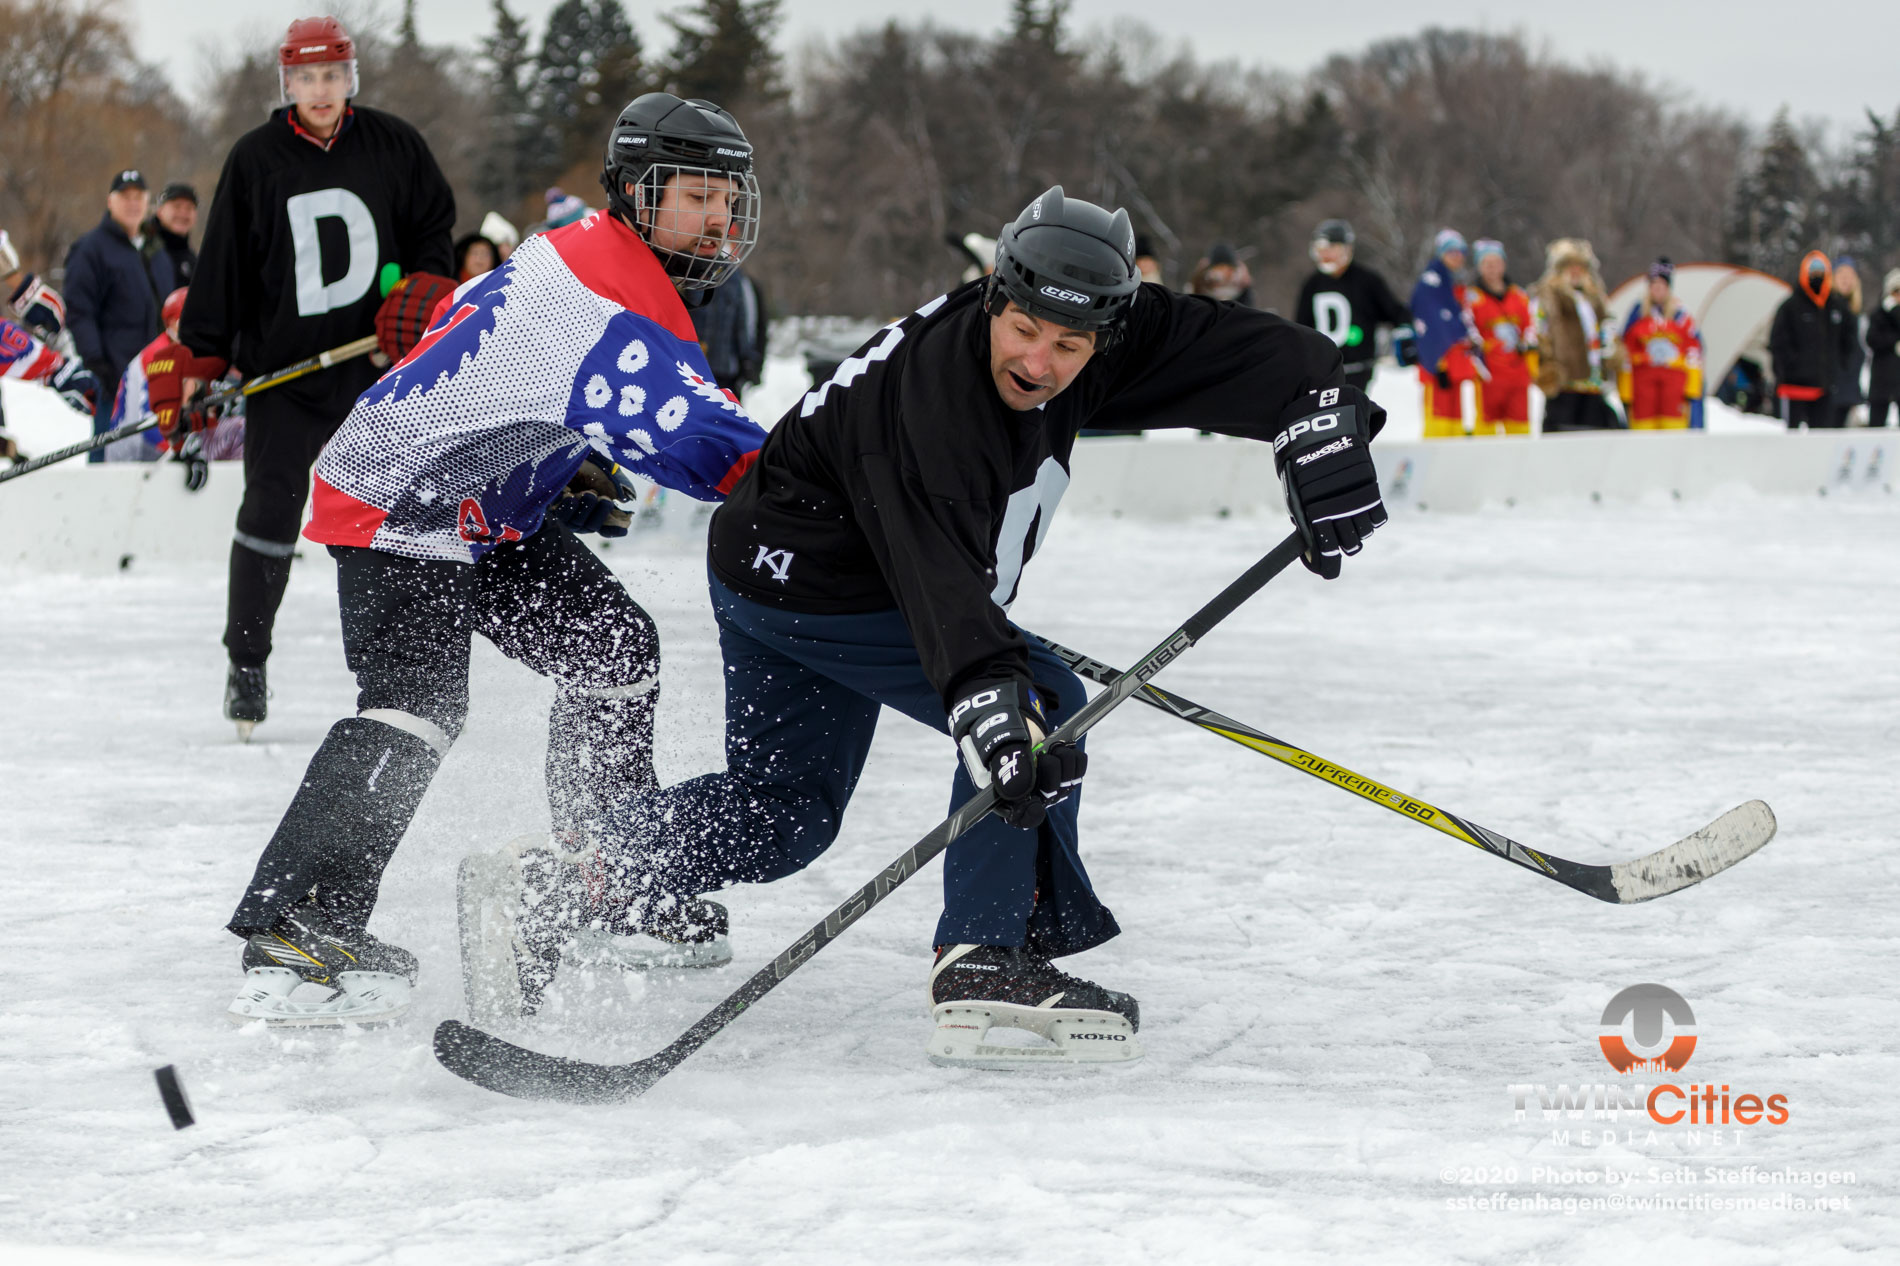 January 25, 2020 - Minneapolis, Minnesota, United States - Scenes from the U.S. Pond Hockey Championships on Lake Nokomis.   (Photo by Seth Steffenhagen/Steffenhagen Photography)